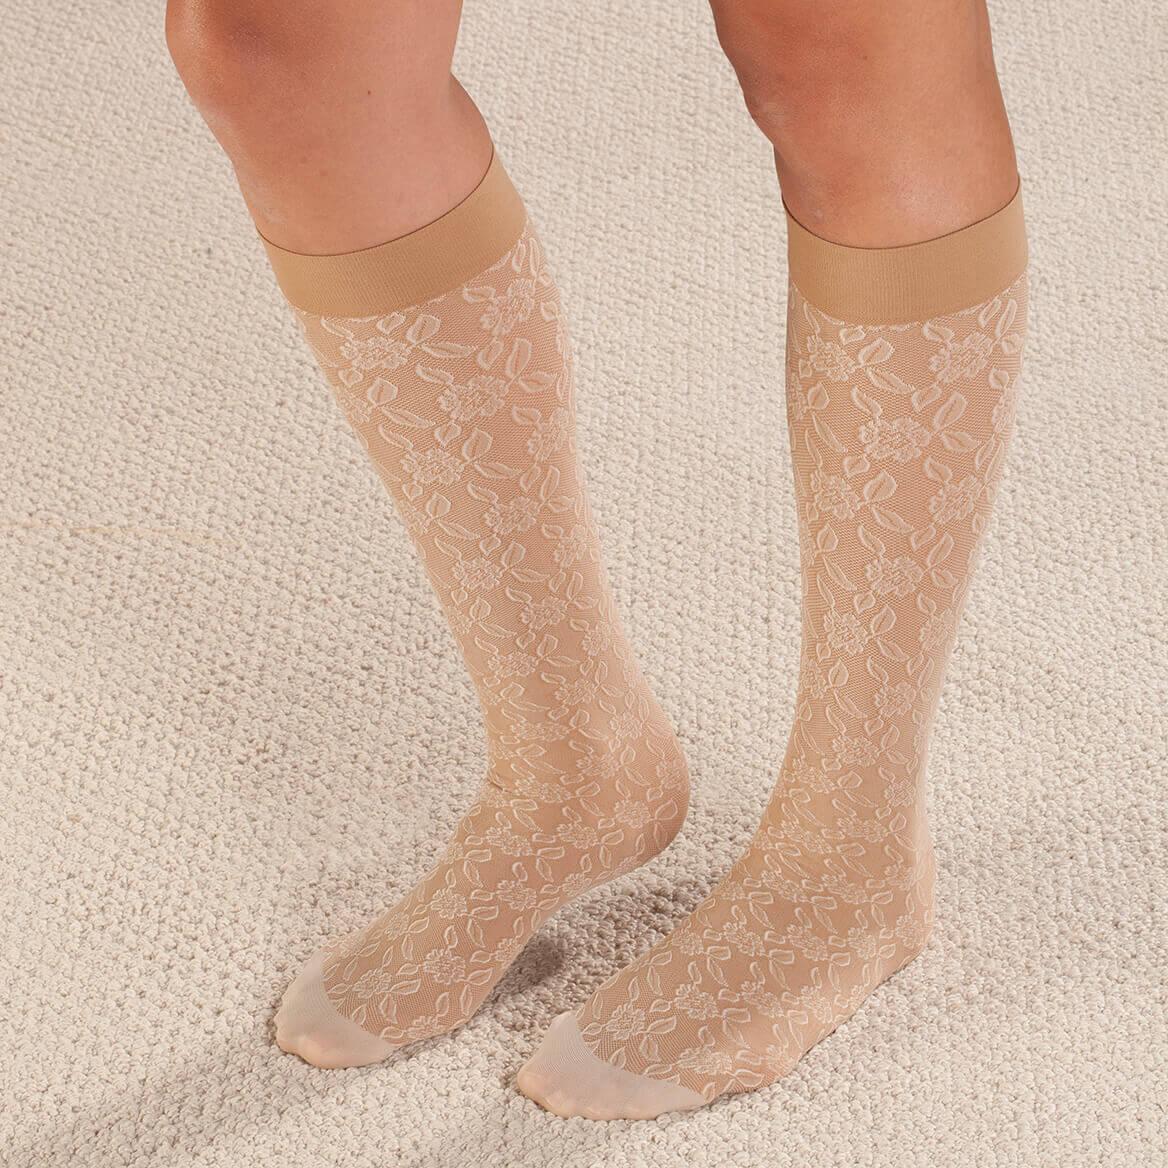 Celeste Stein Lace Compression Socks, 8-15 mmHg-362443